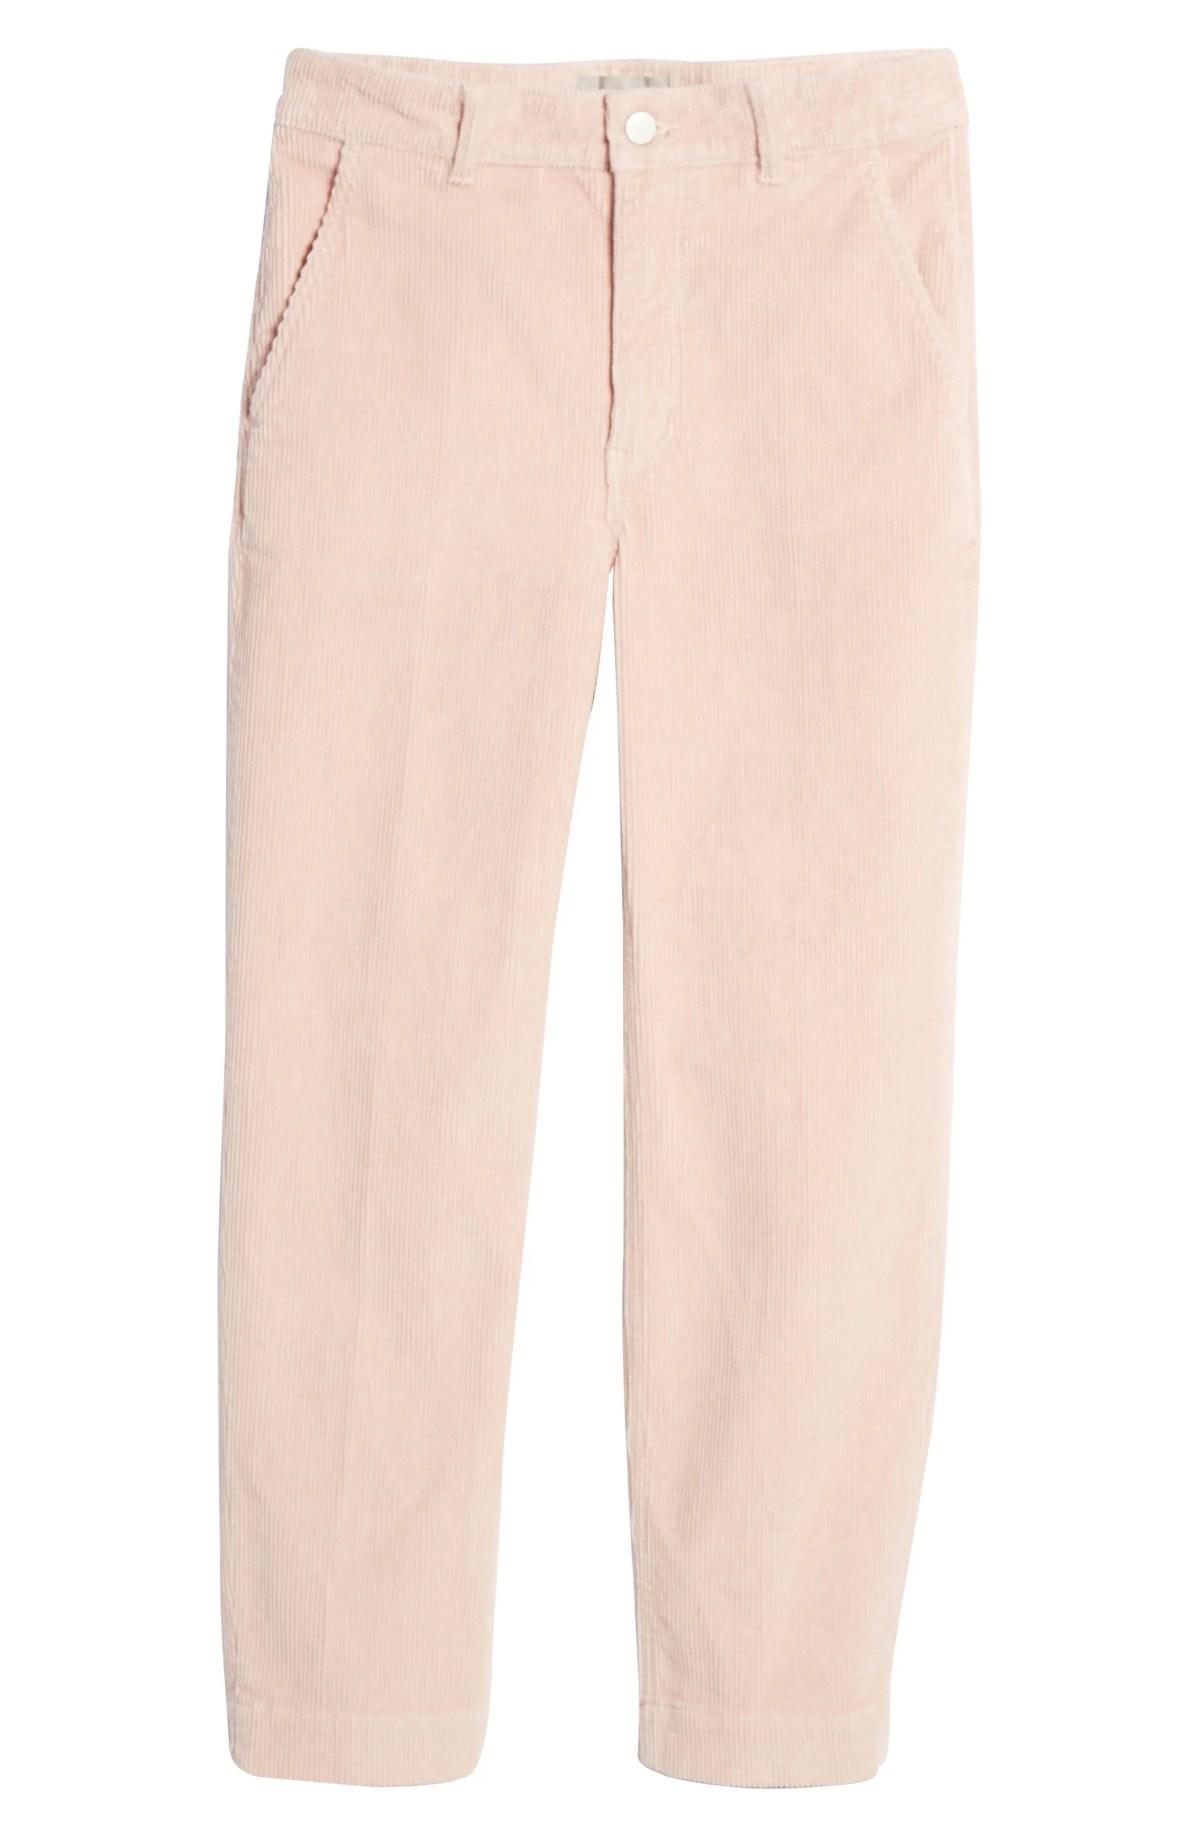 EVERLANE The Corduroy Straight Leg Crop Pants, Main, color, DUSTY PETAL